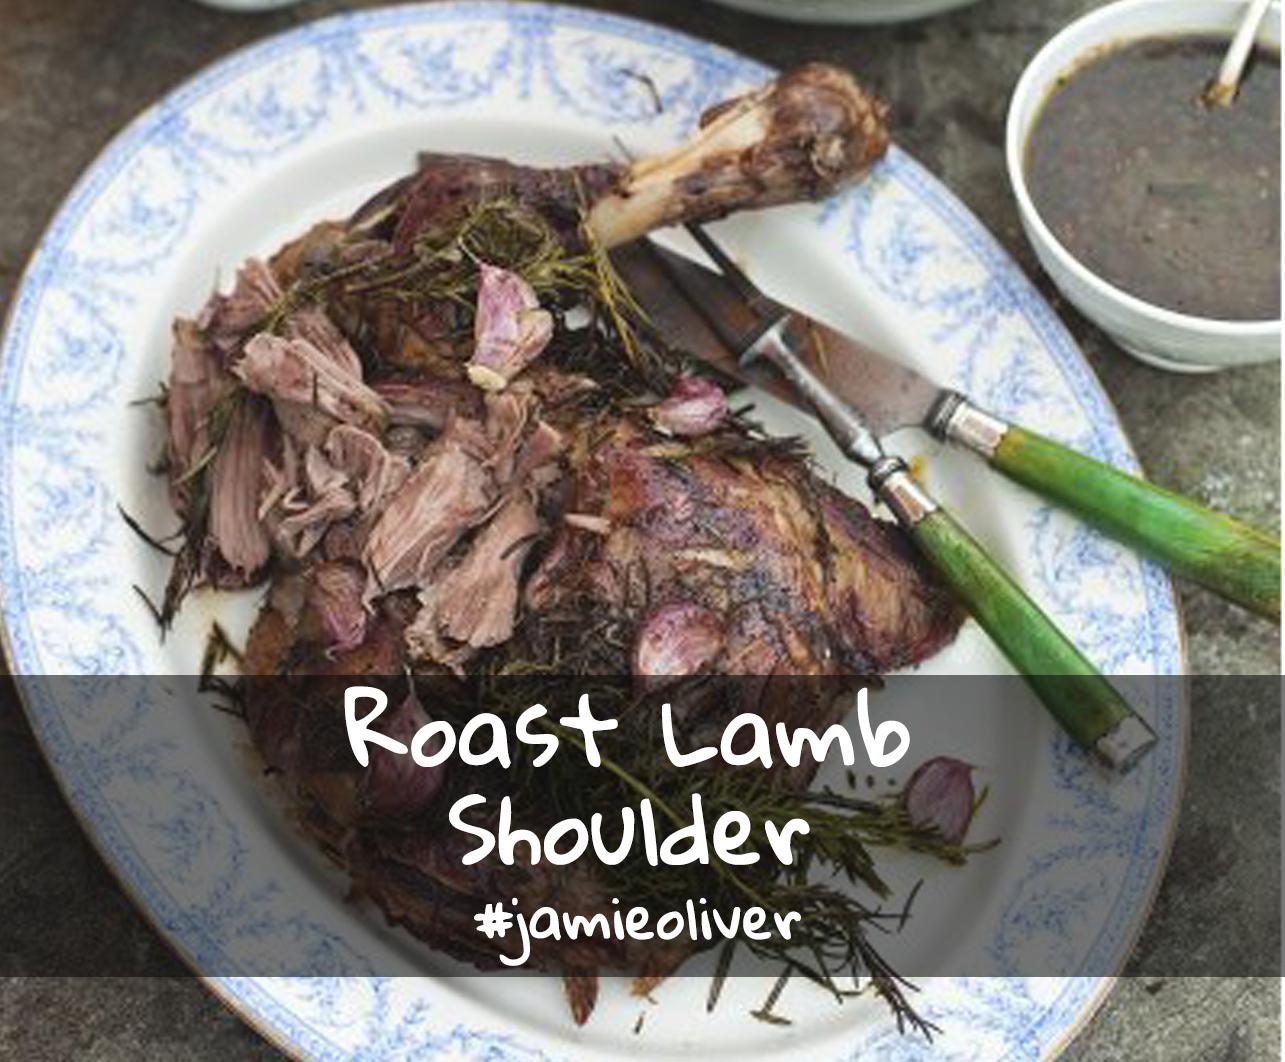 Roast lamb shoulder.jpg